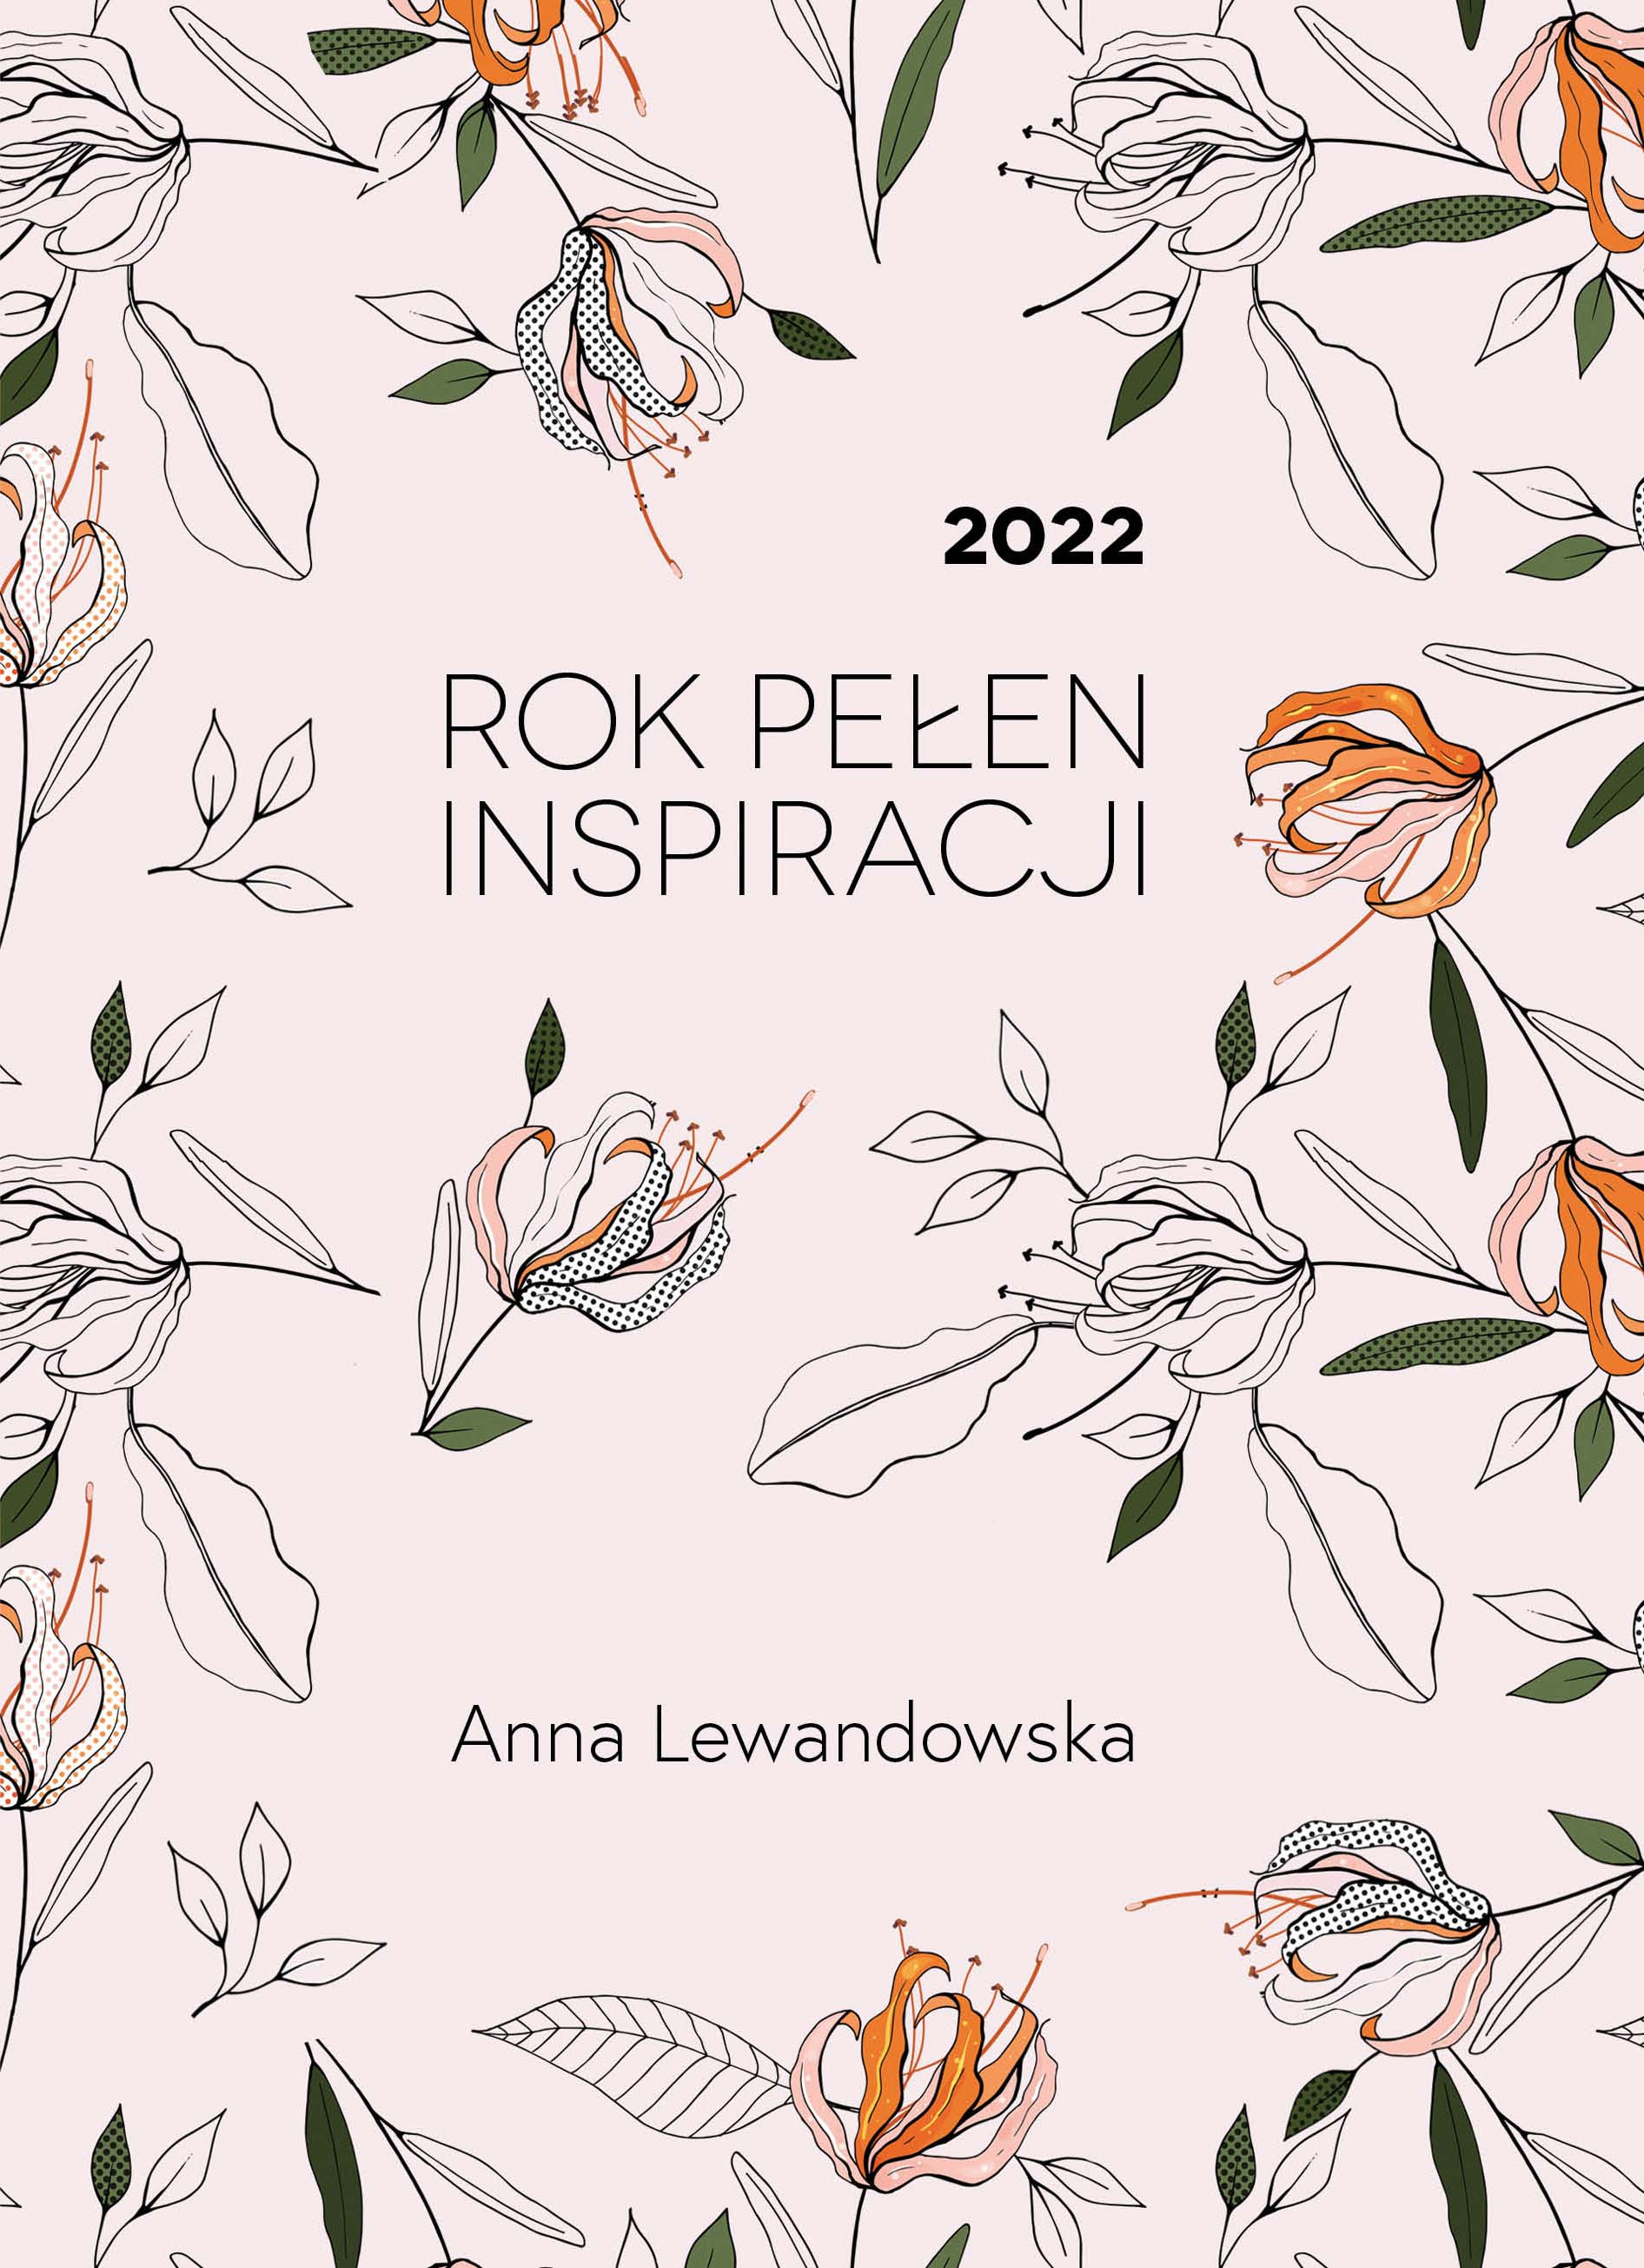 2022. Rok pełen inspiracji